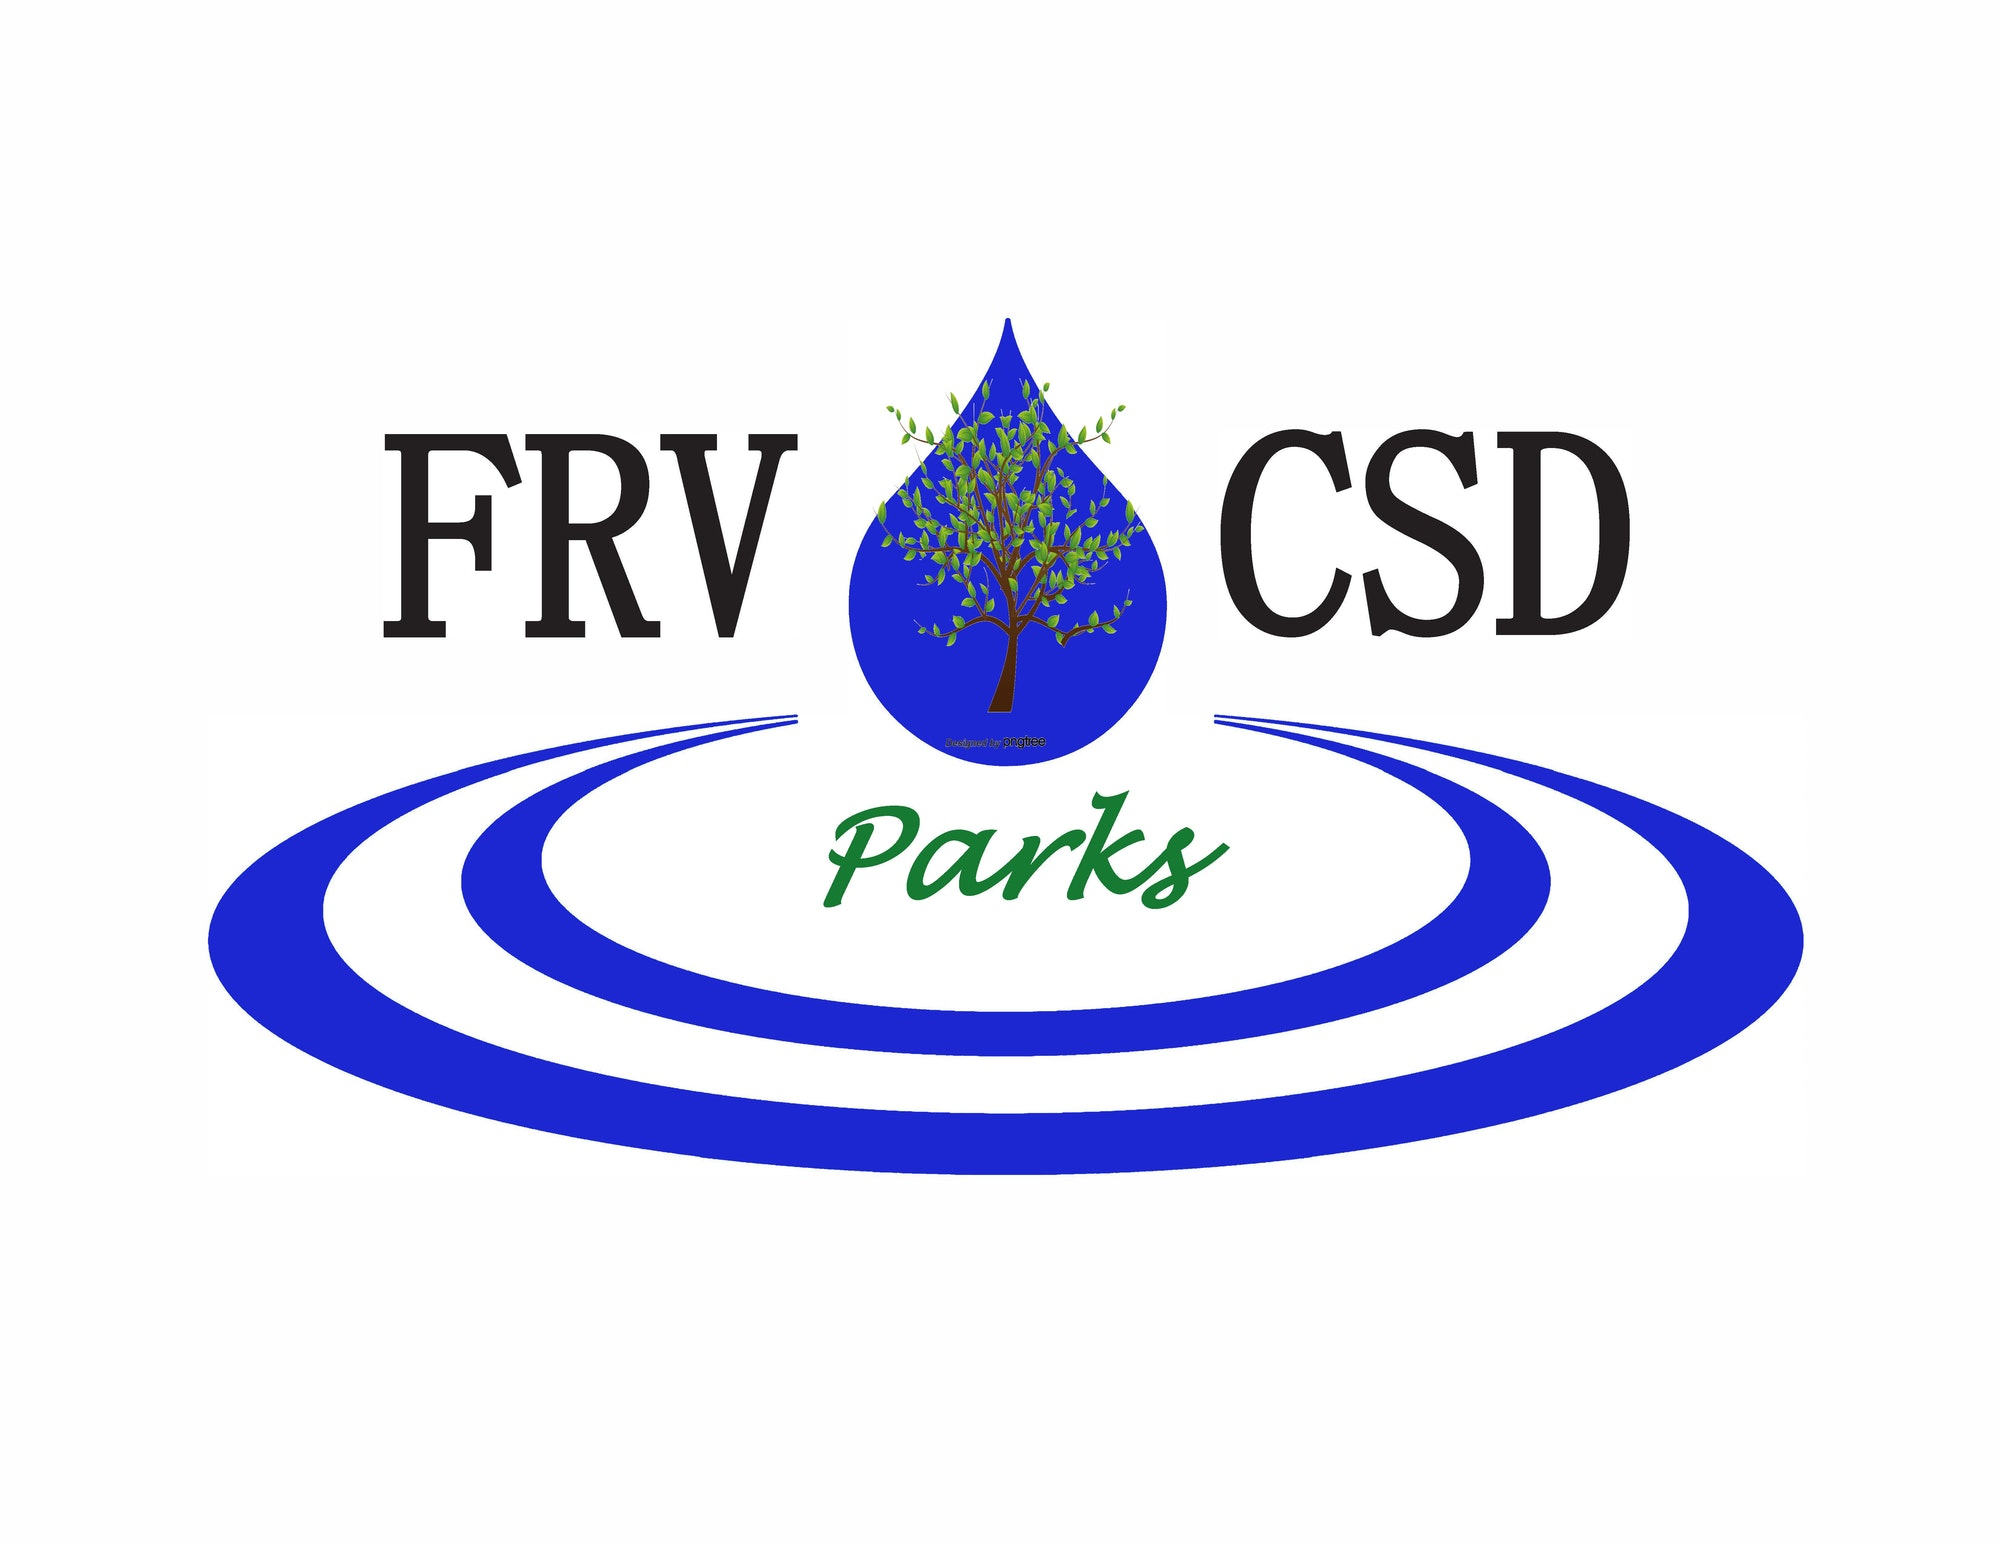 FRVCSD Parks Department